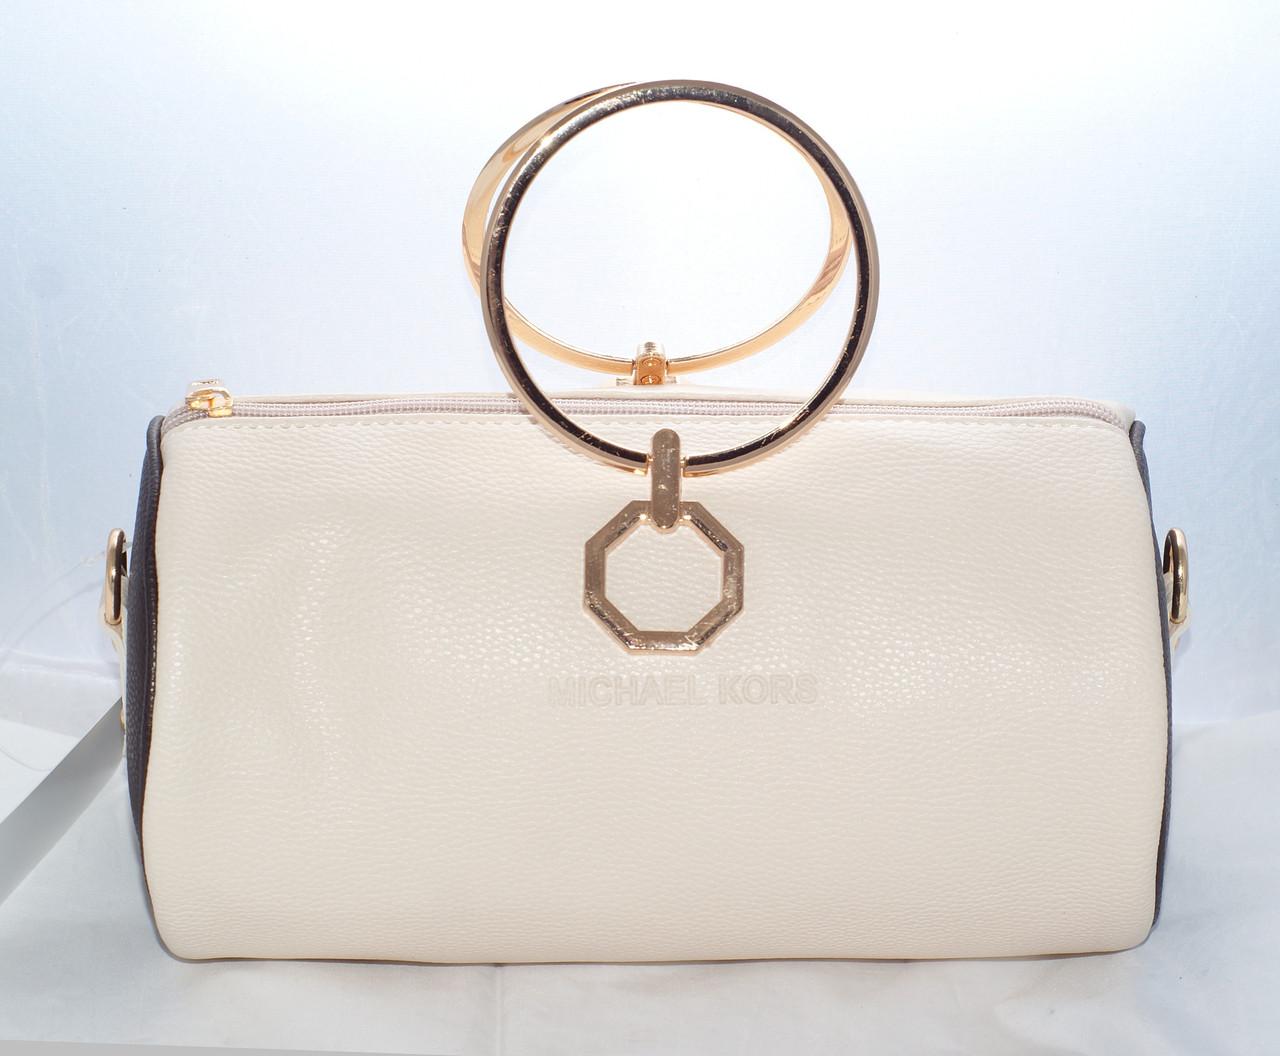 Женская мини сумка Michael Kors (Майкл Корс), бежевая с коричневым, ... 8230555121a